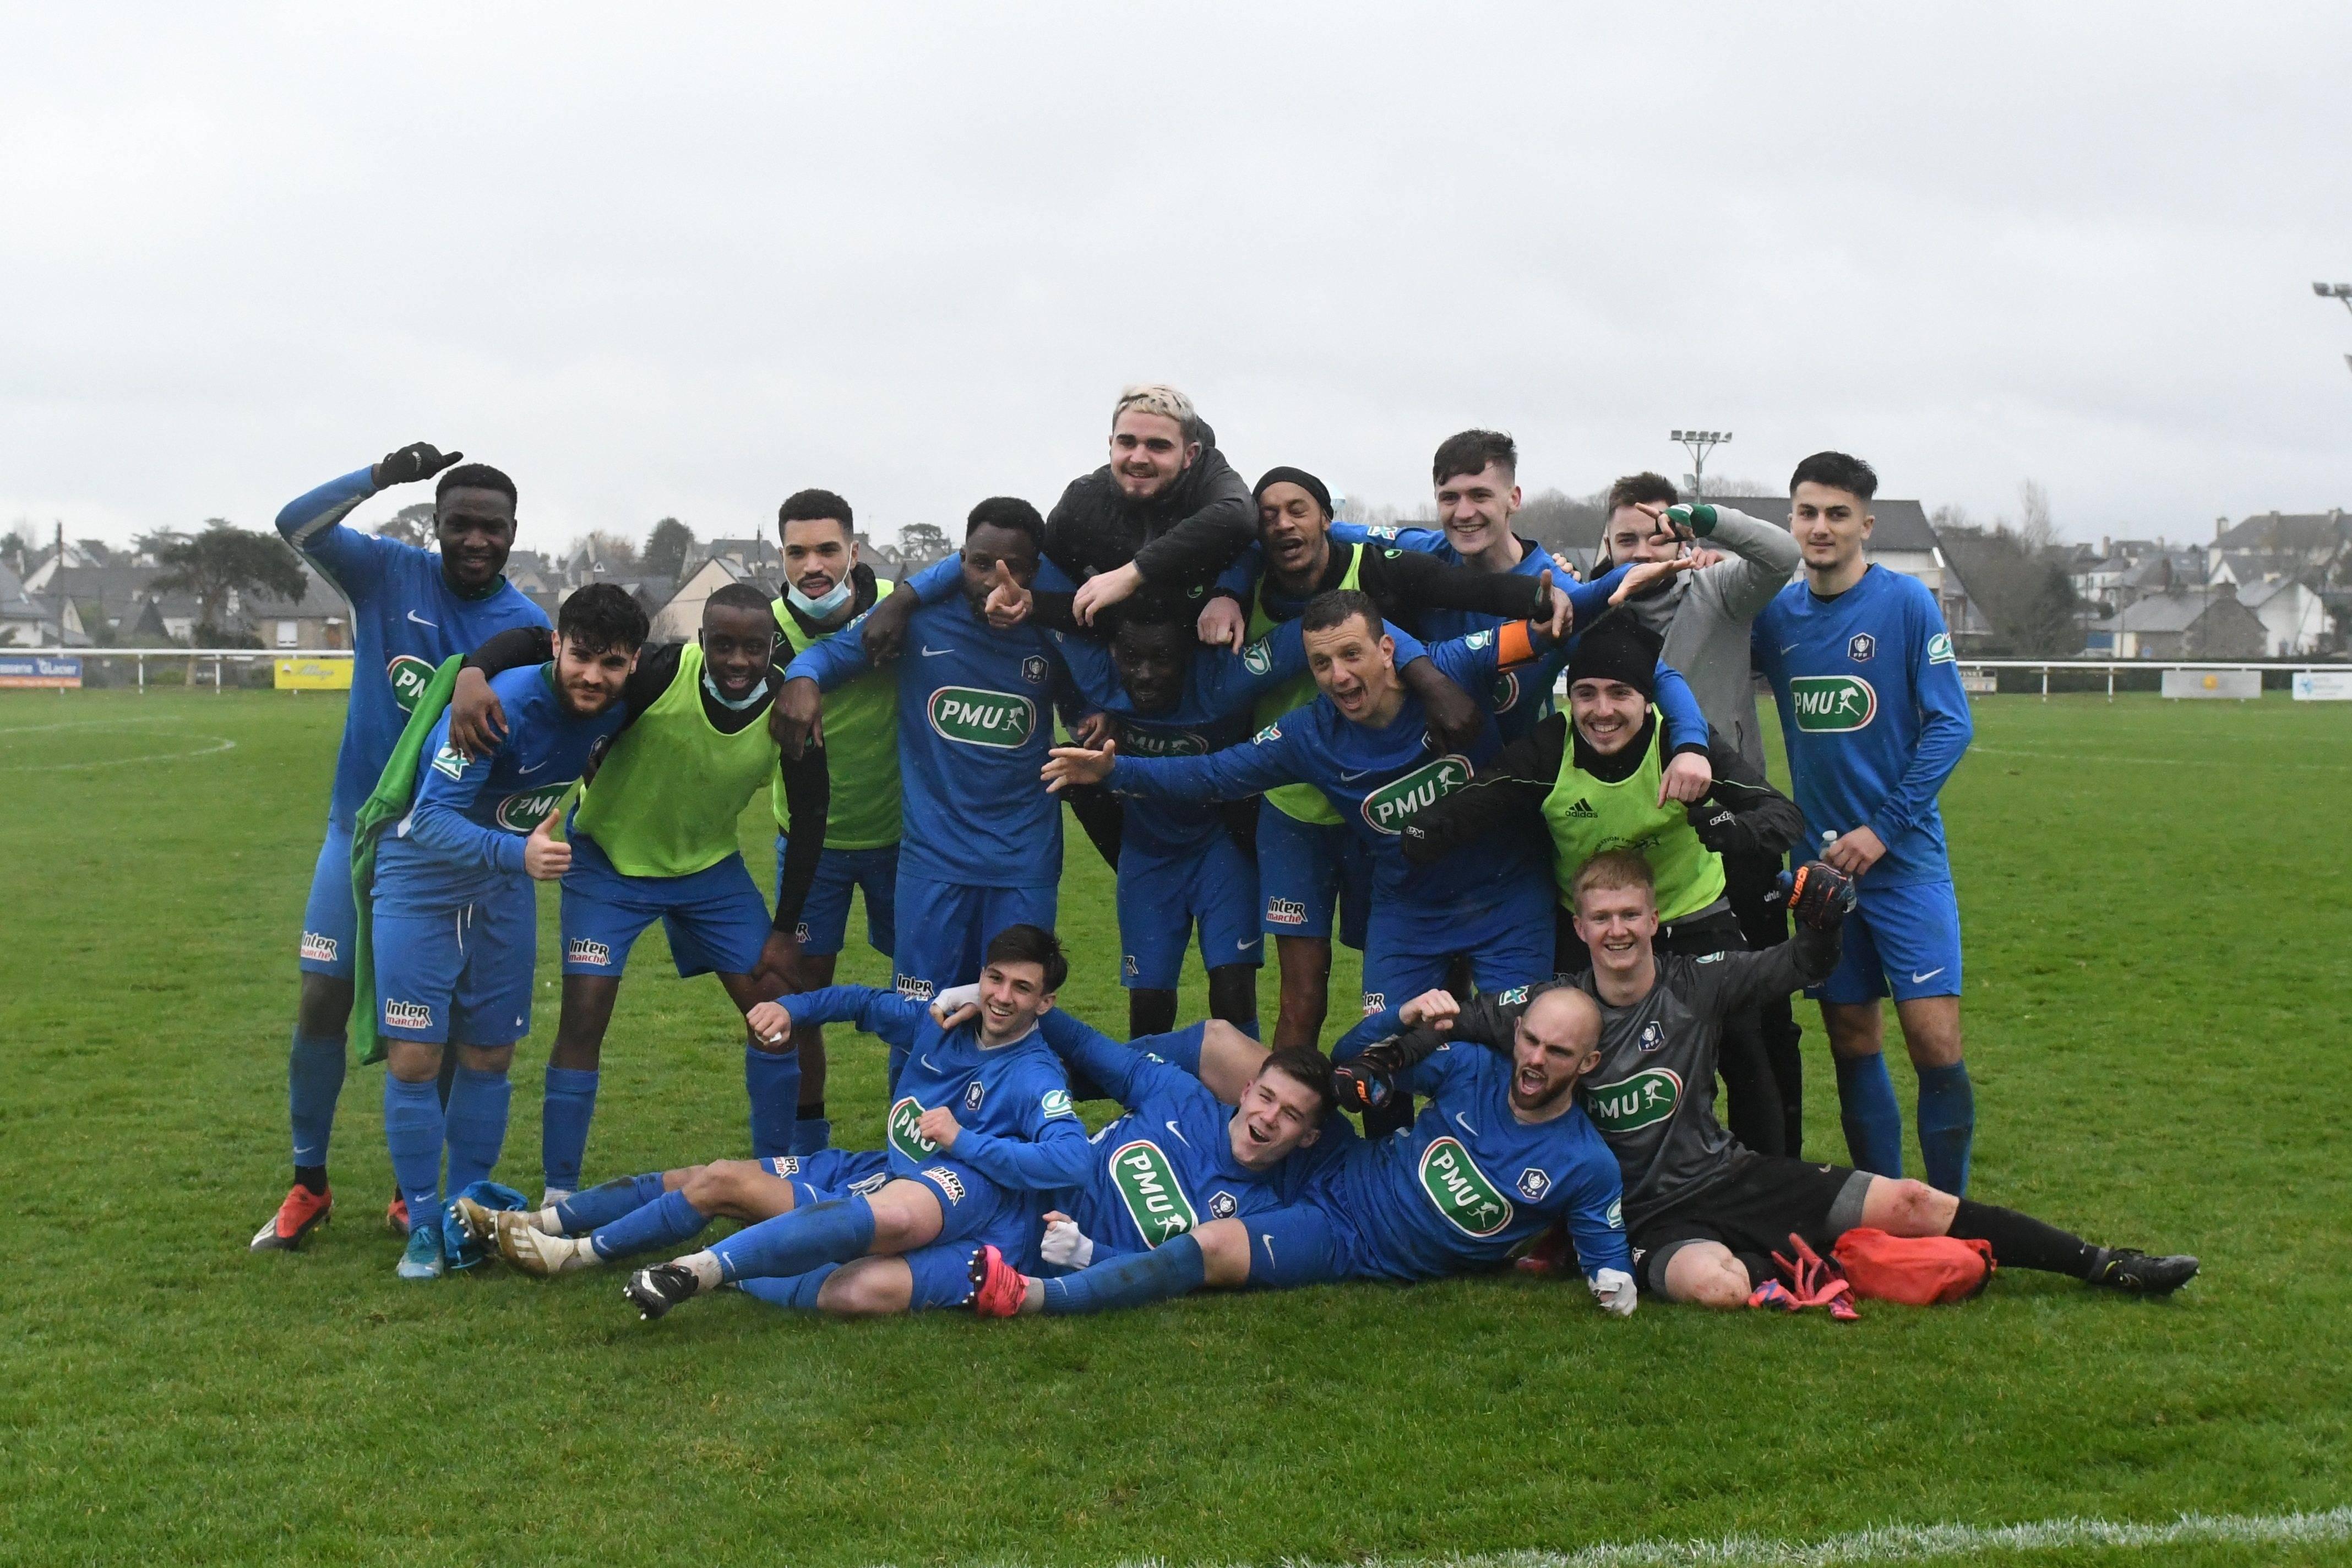 FC Dinard (R2) - Saint-Colomban Locminé (N3)